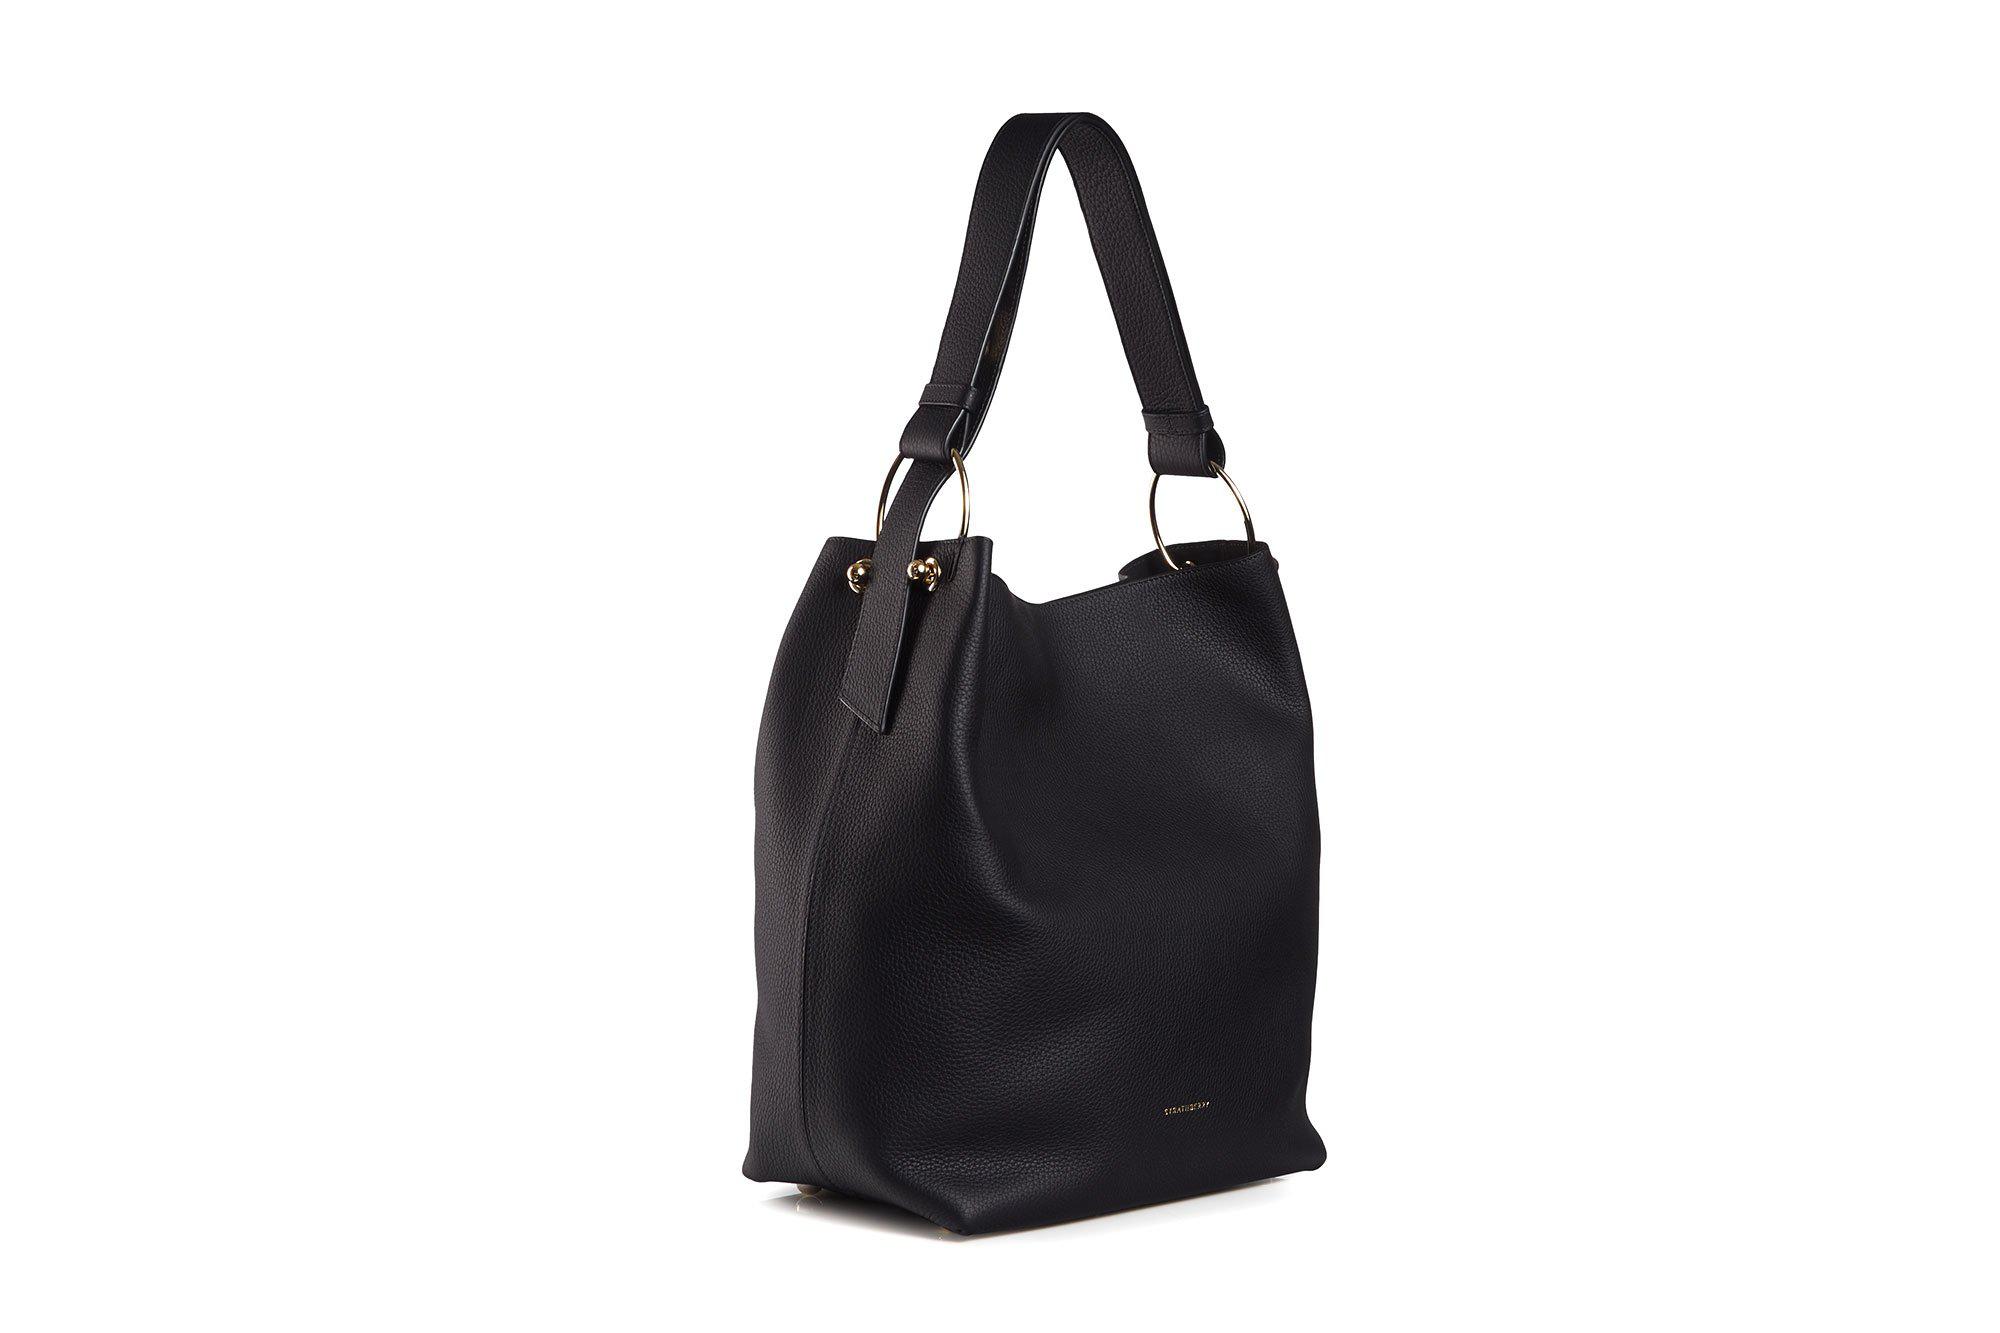 43acb0f40805 Shop Strathberry Lana Bucket Bag - Black